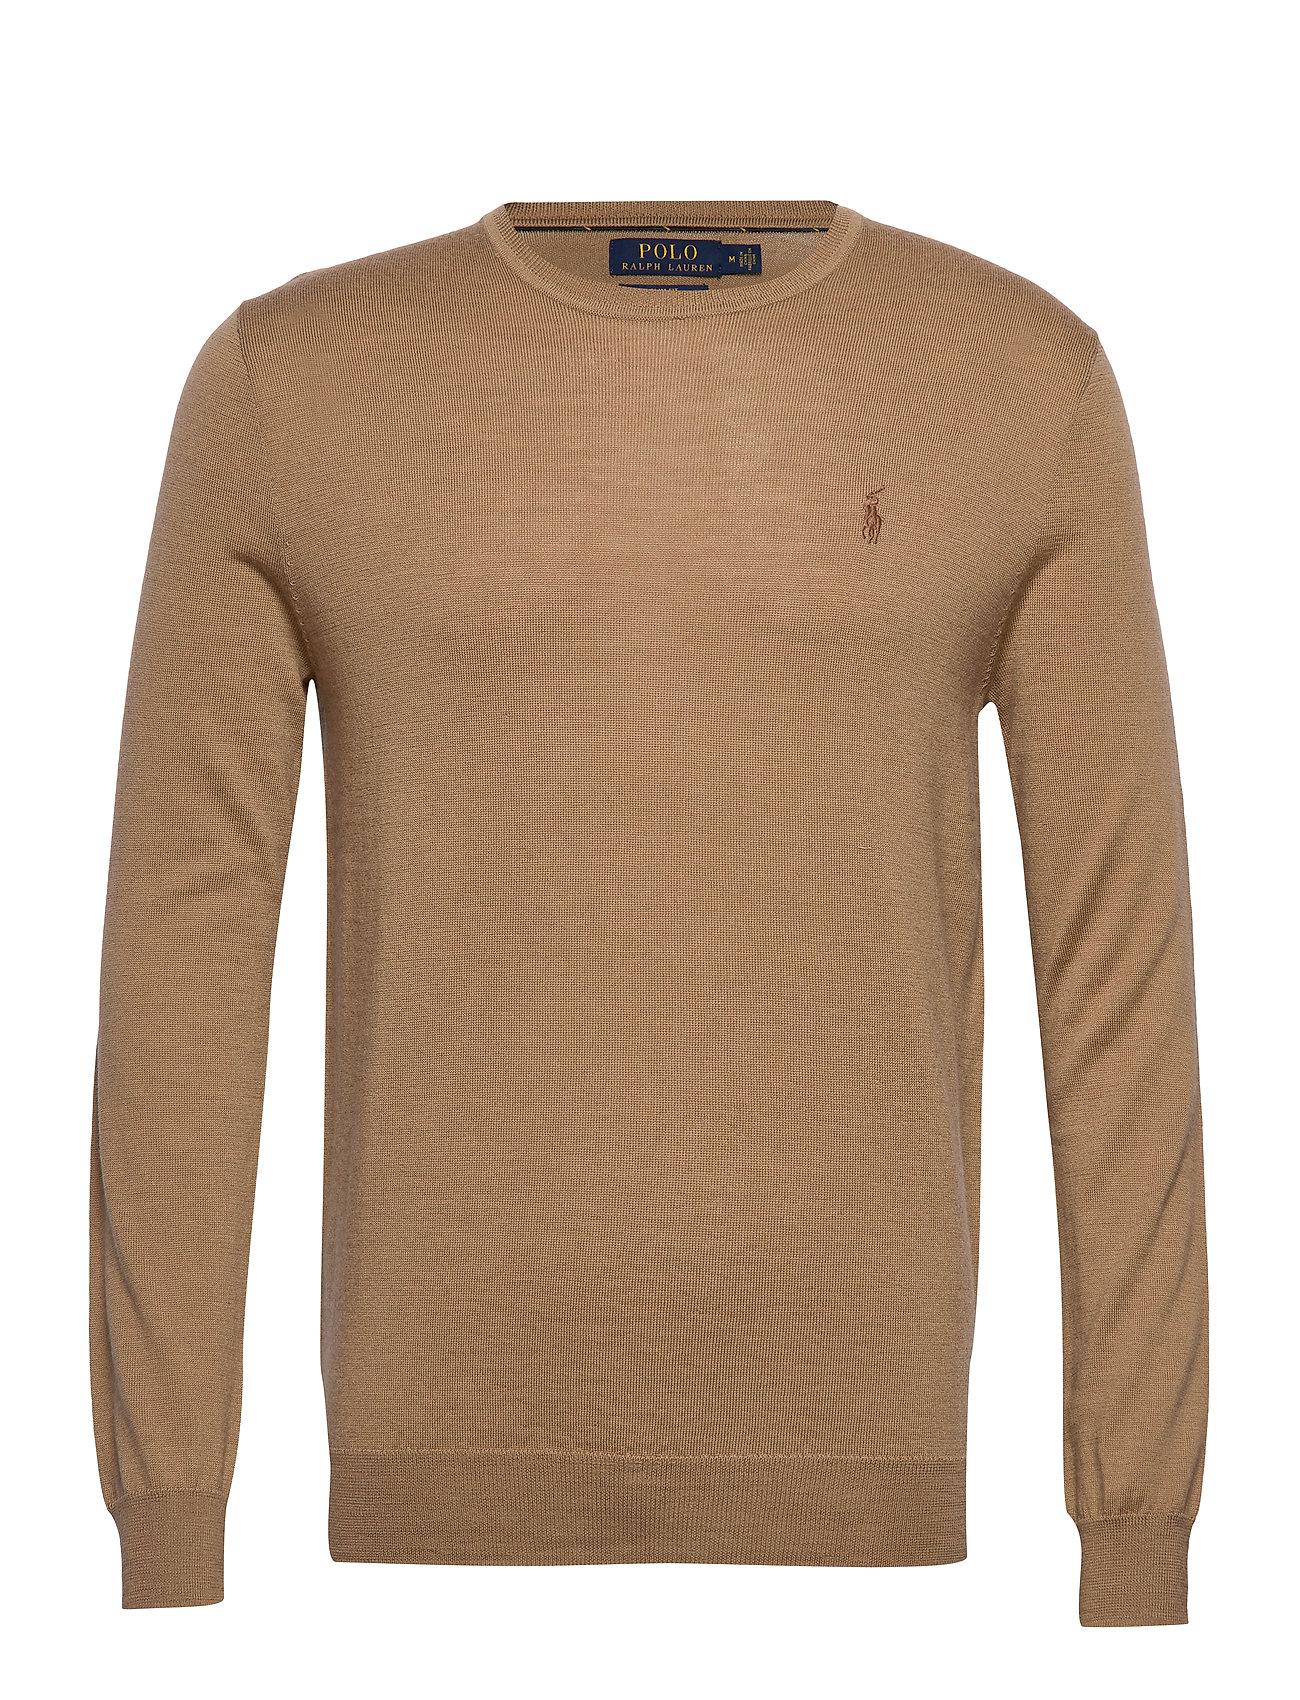 Polo Ralph Lauren Slim Washable Merino Sweater - LUXURY TAN HEATHE